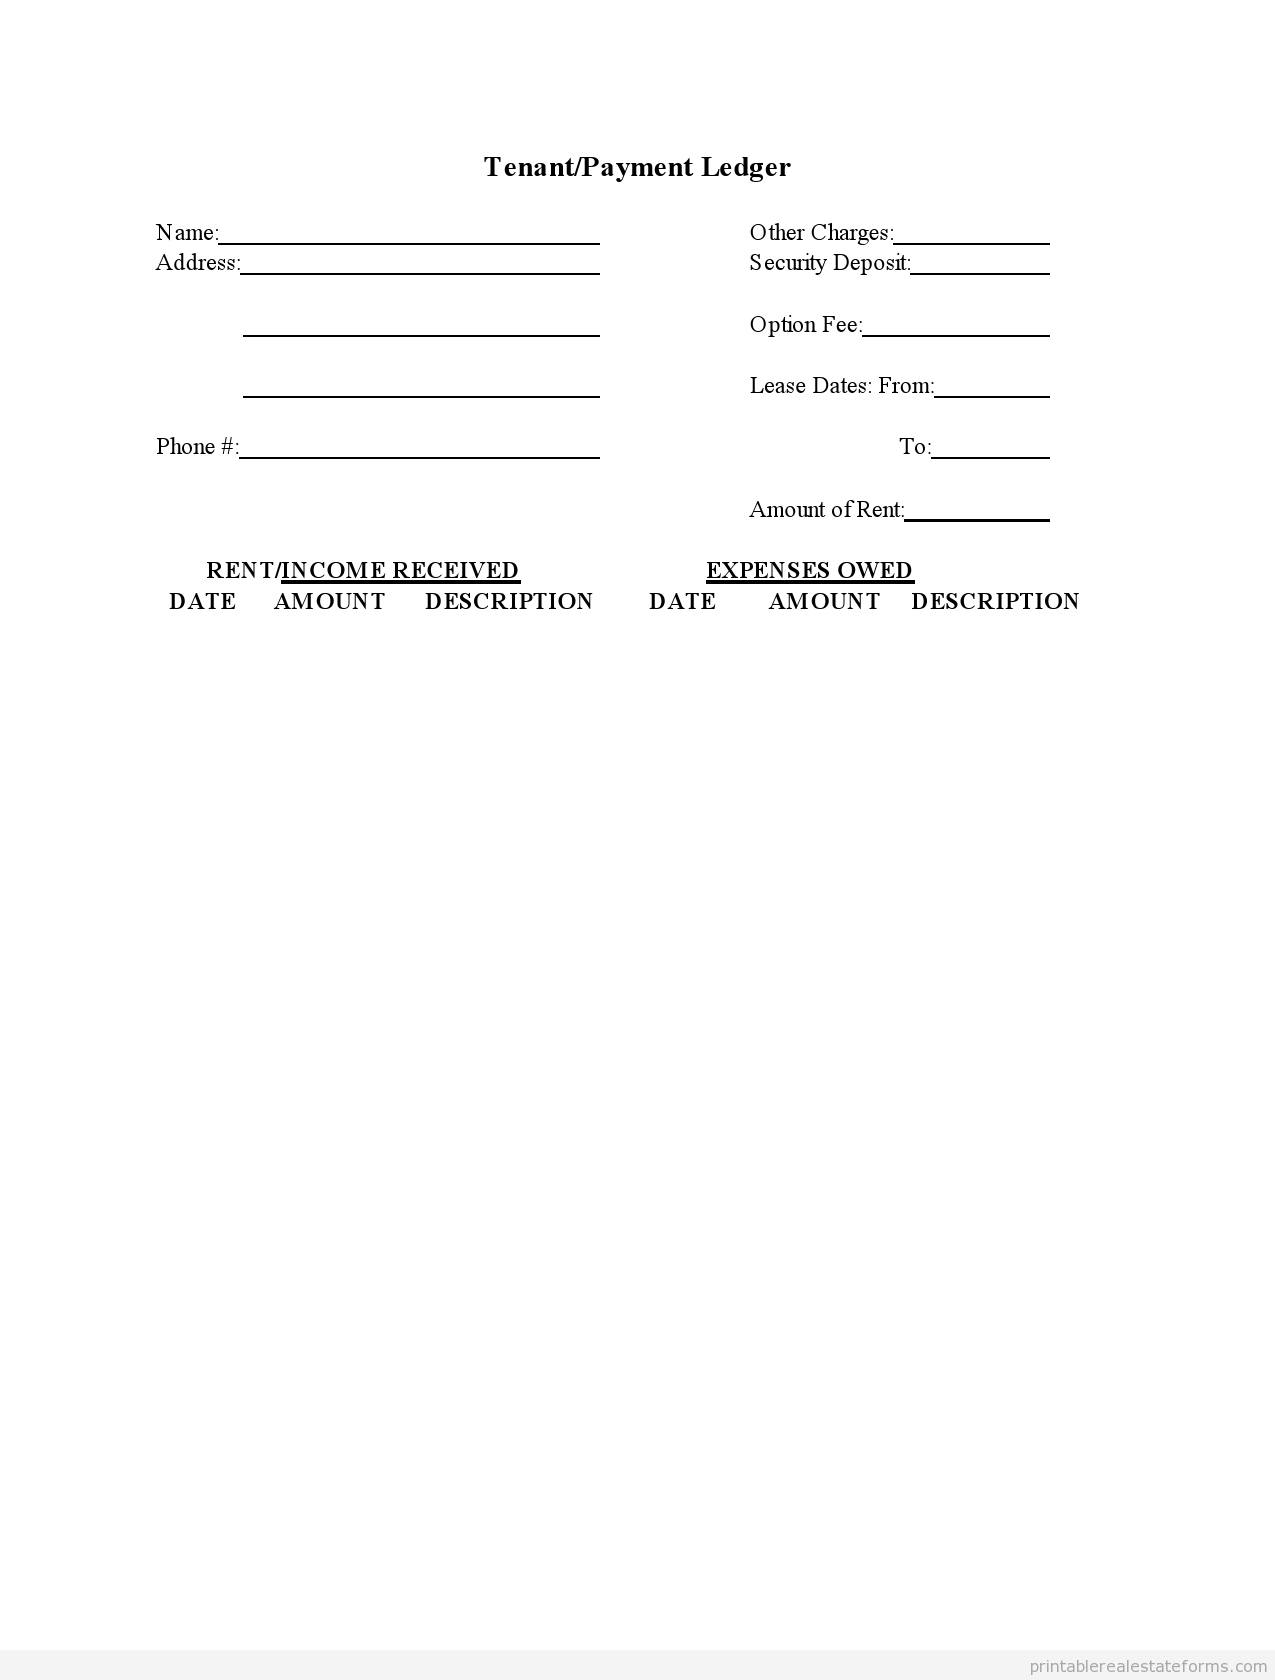 Free Printable Rental Ledger Template Form (Sample Pdf) - Free Printable Rent Ledger